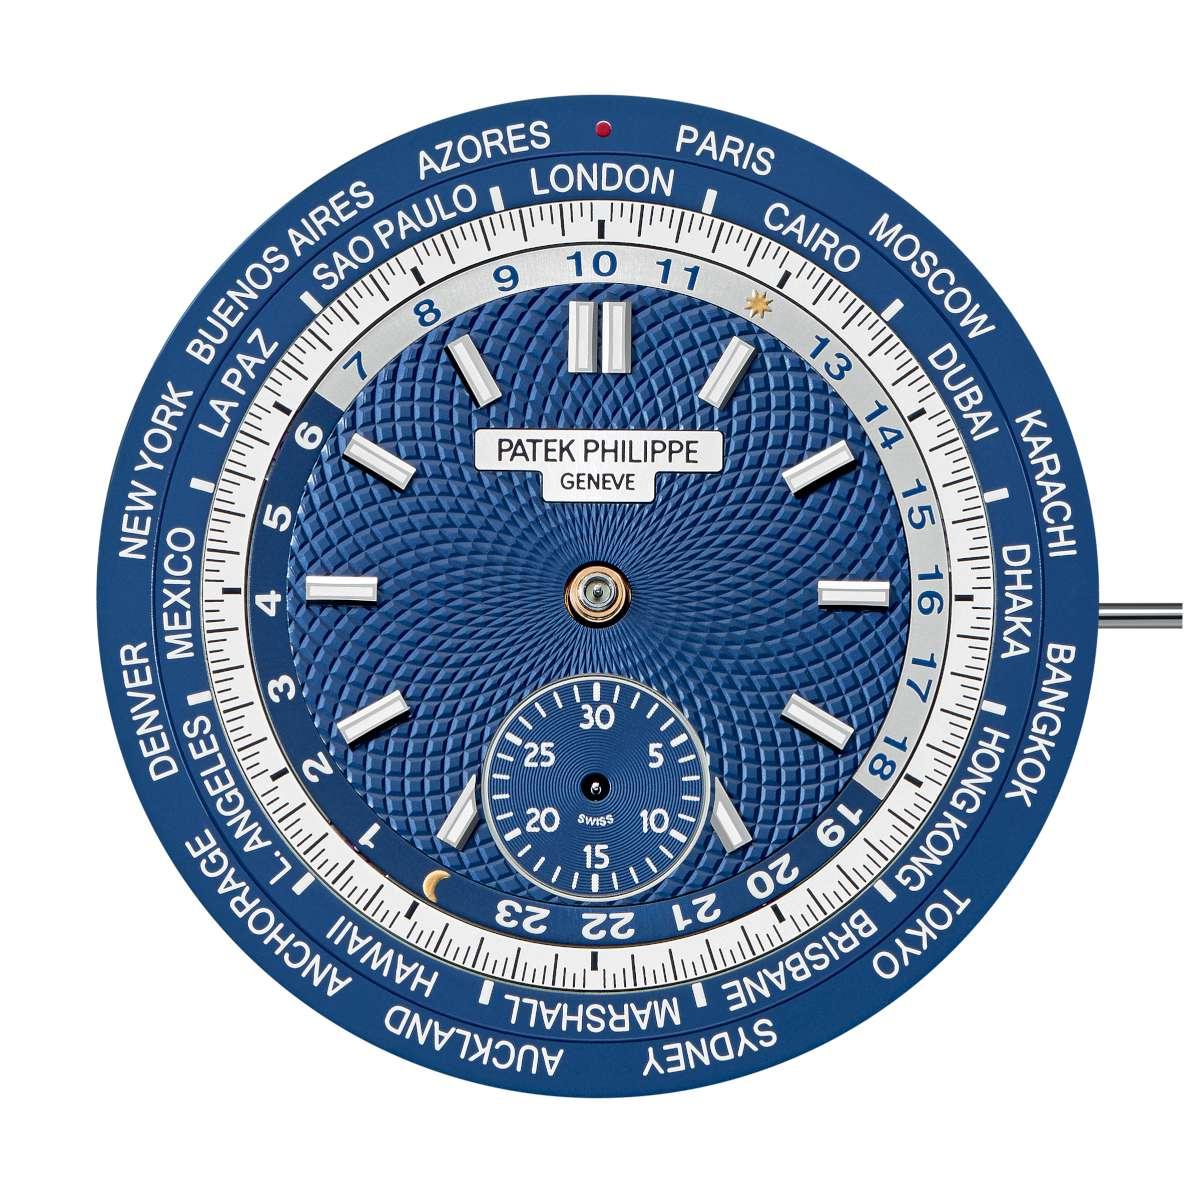 Patek Philippe World Time Chronograph ref. 5930 dial